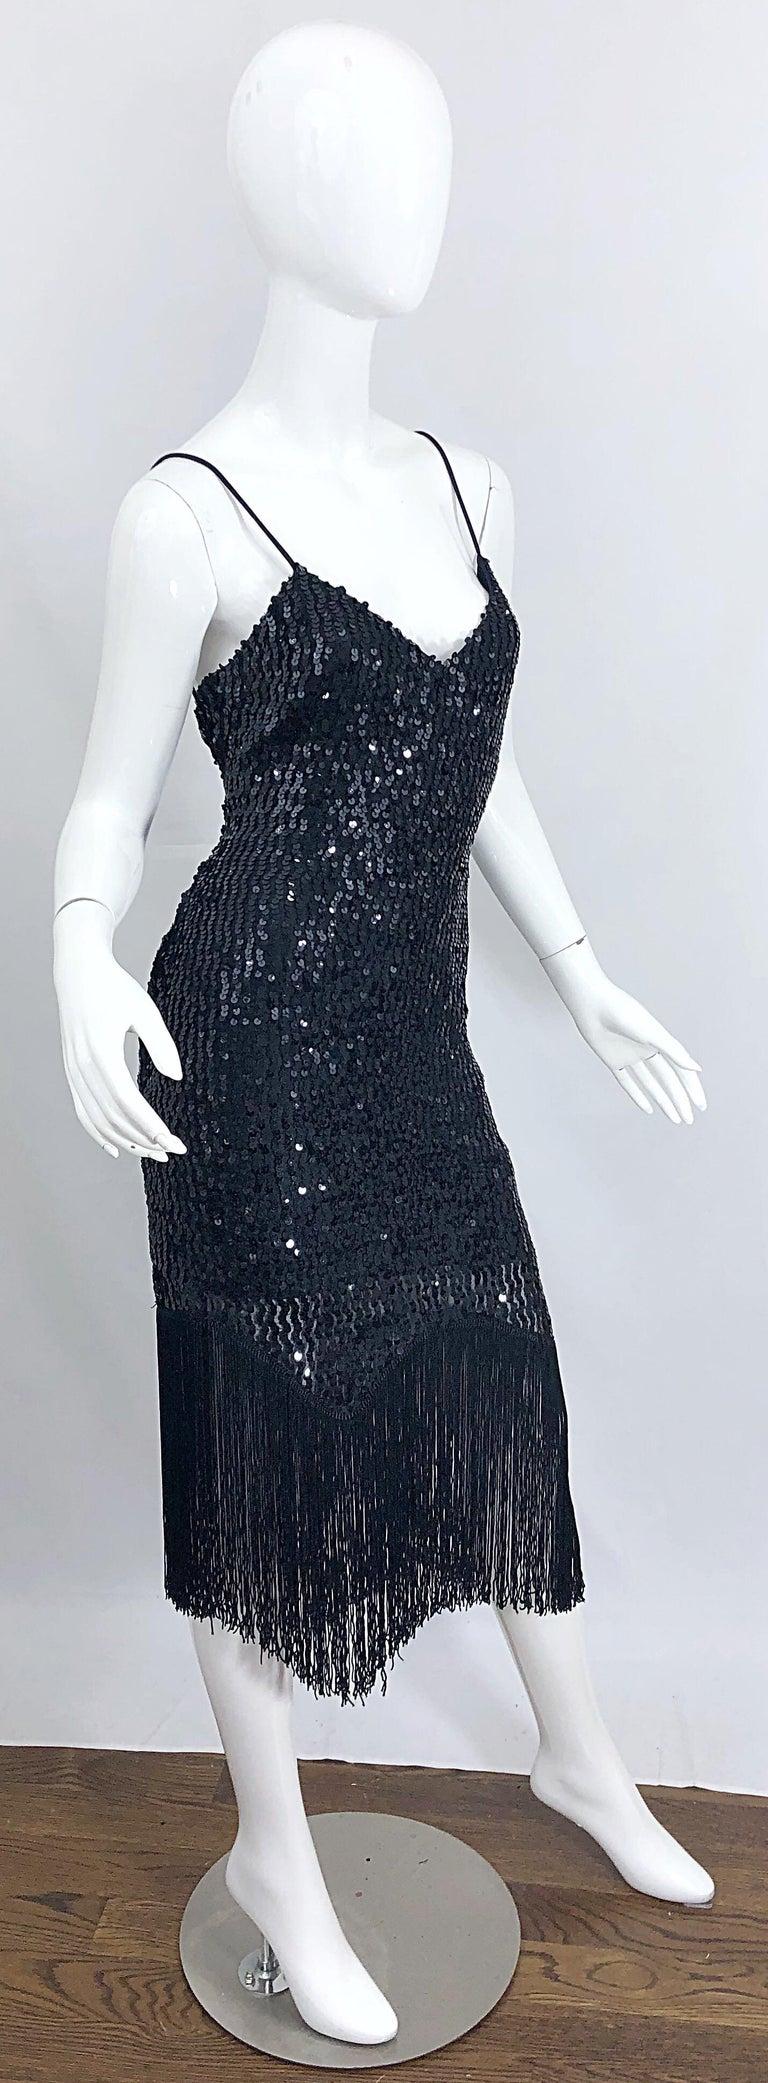 NWT 1970s Joy Stevens Size 10 / 12 Black Sequined Flapper Style Vintage Dress For Sale 8